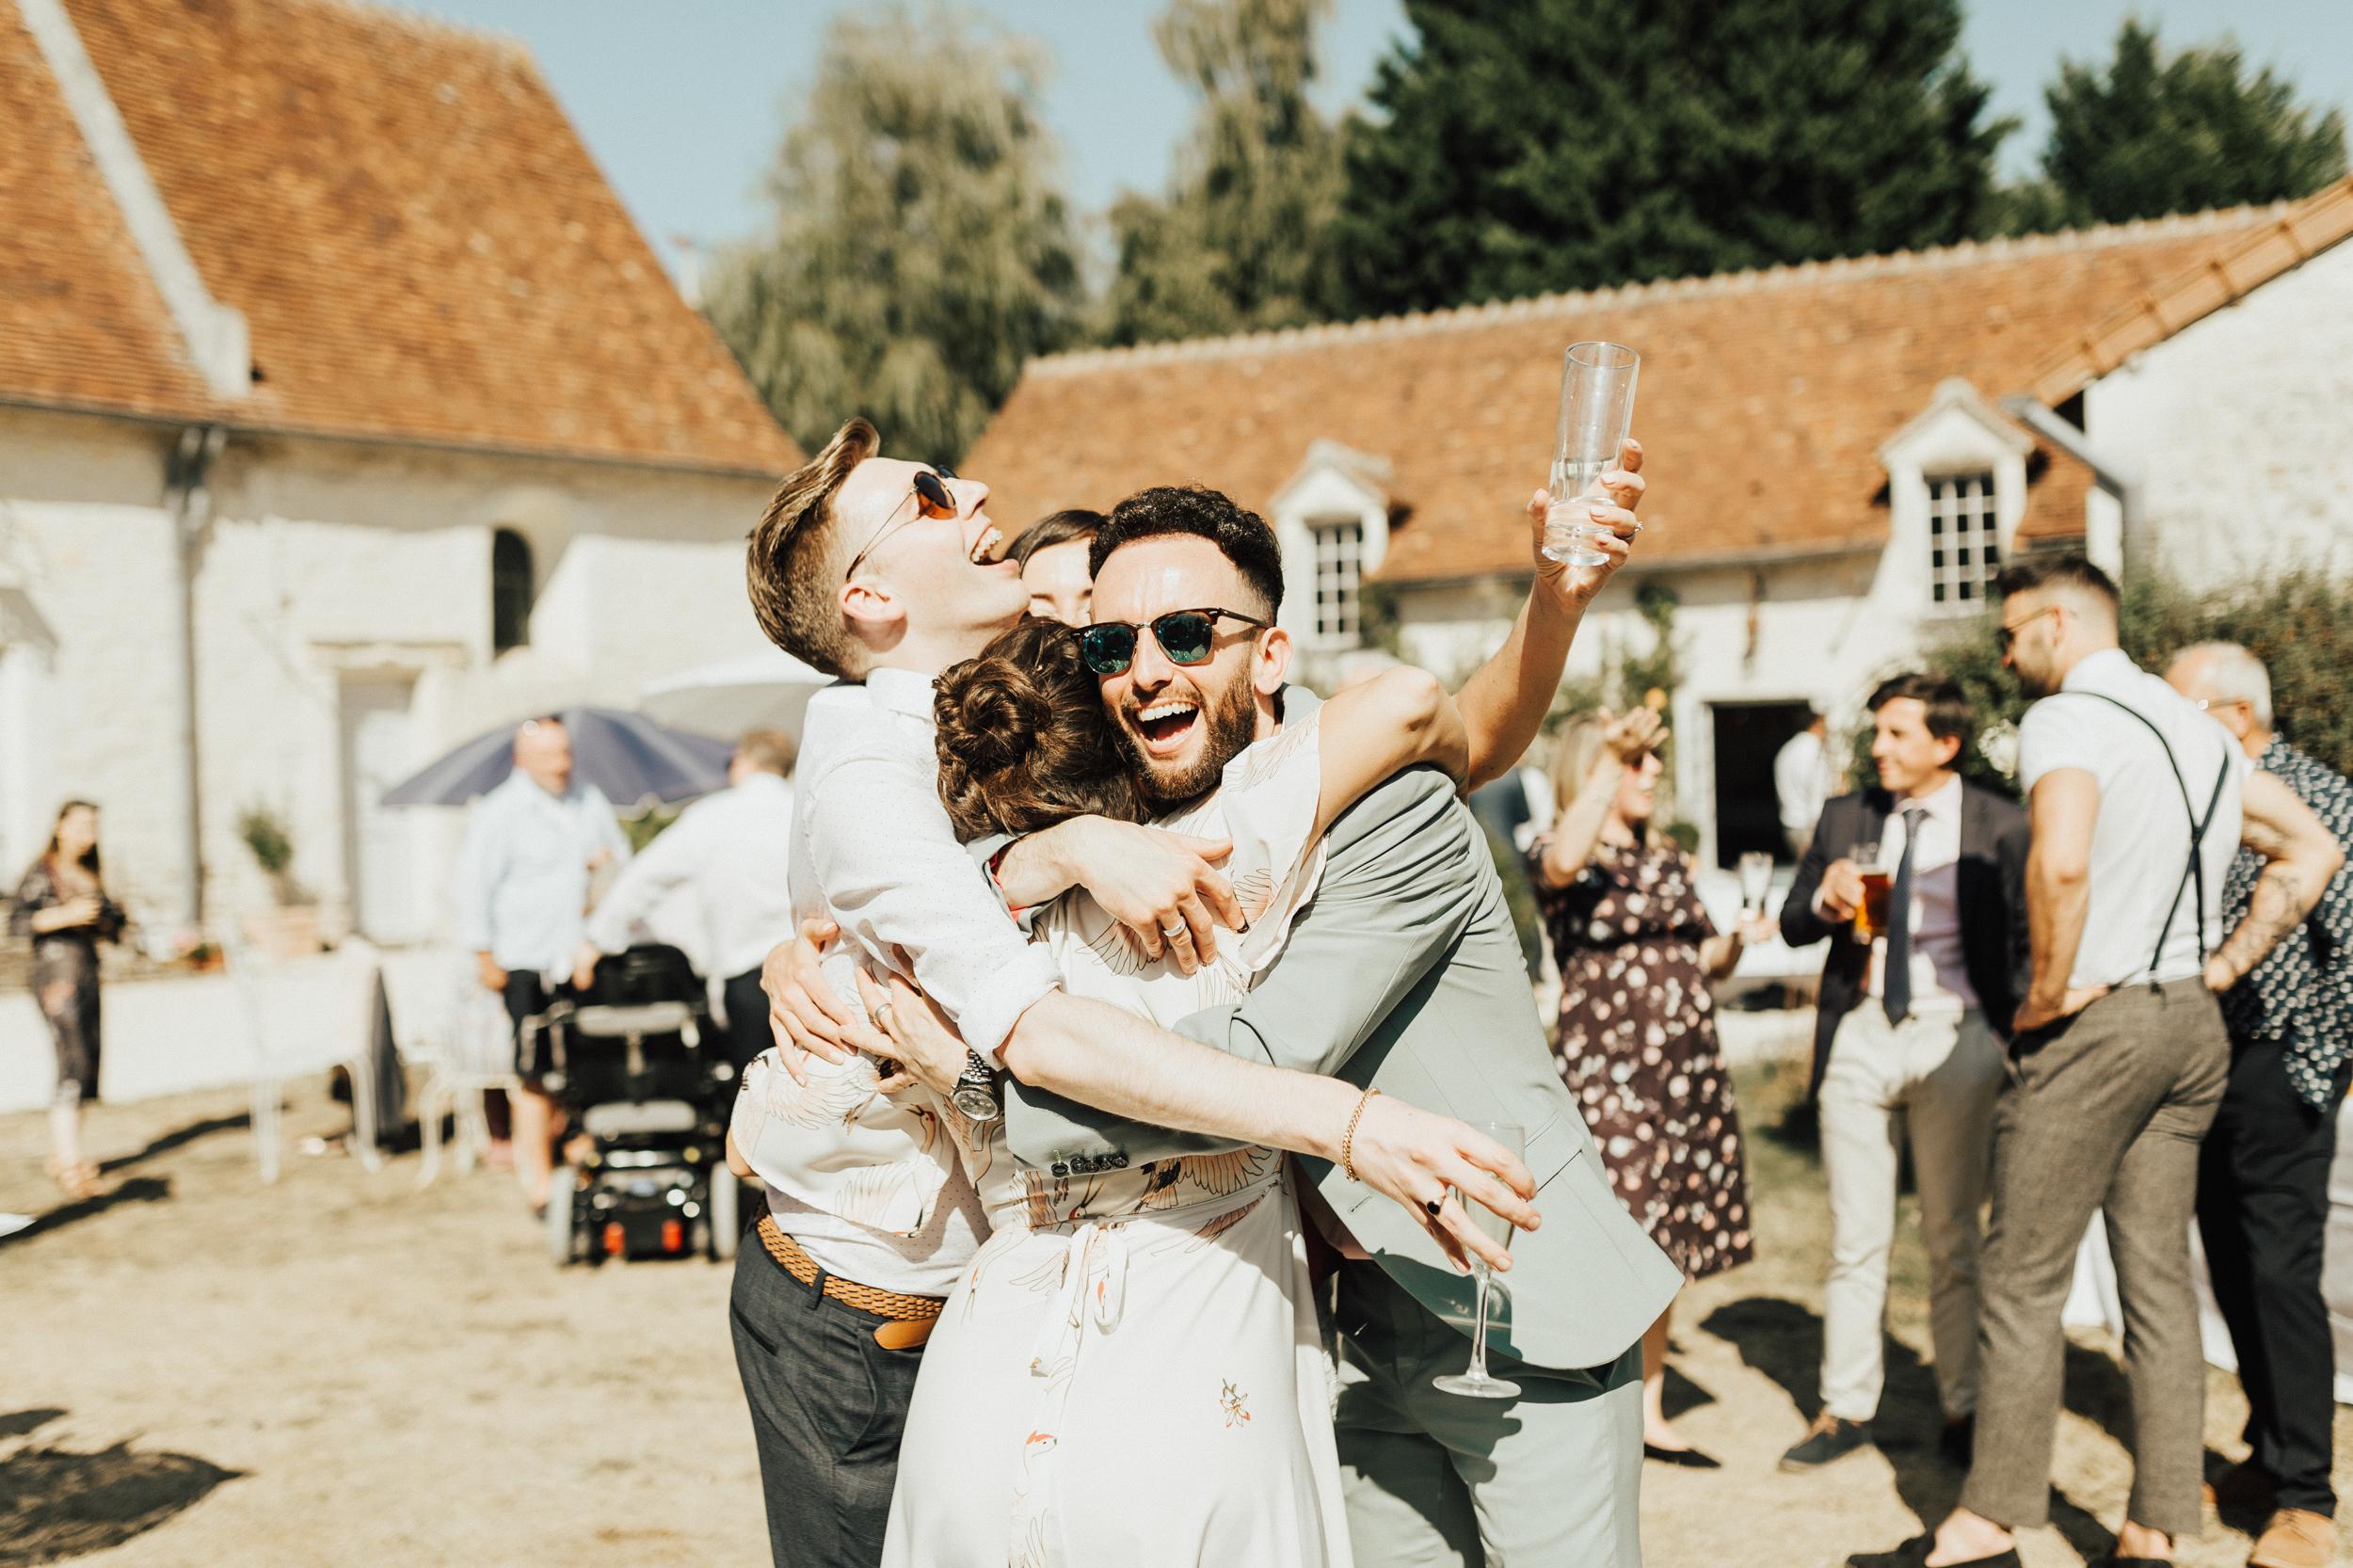 Amy-Zac-Destination-Wedding-France-Manoir-Foulquetiere-Darina-Stoda-Photography-55.jpg